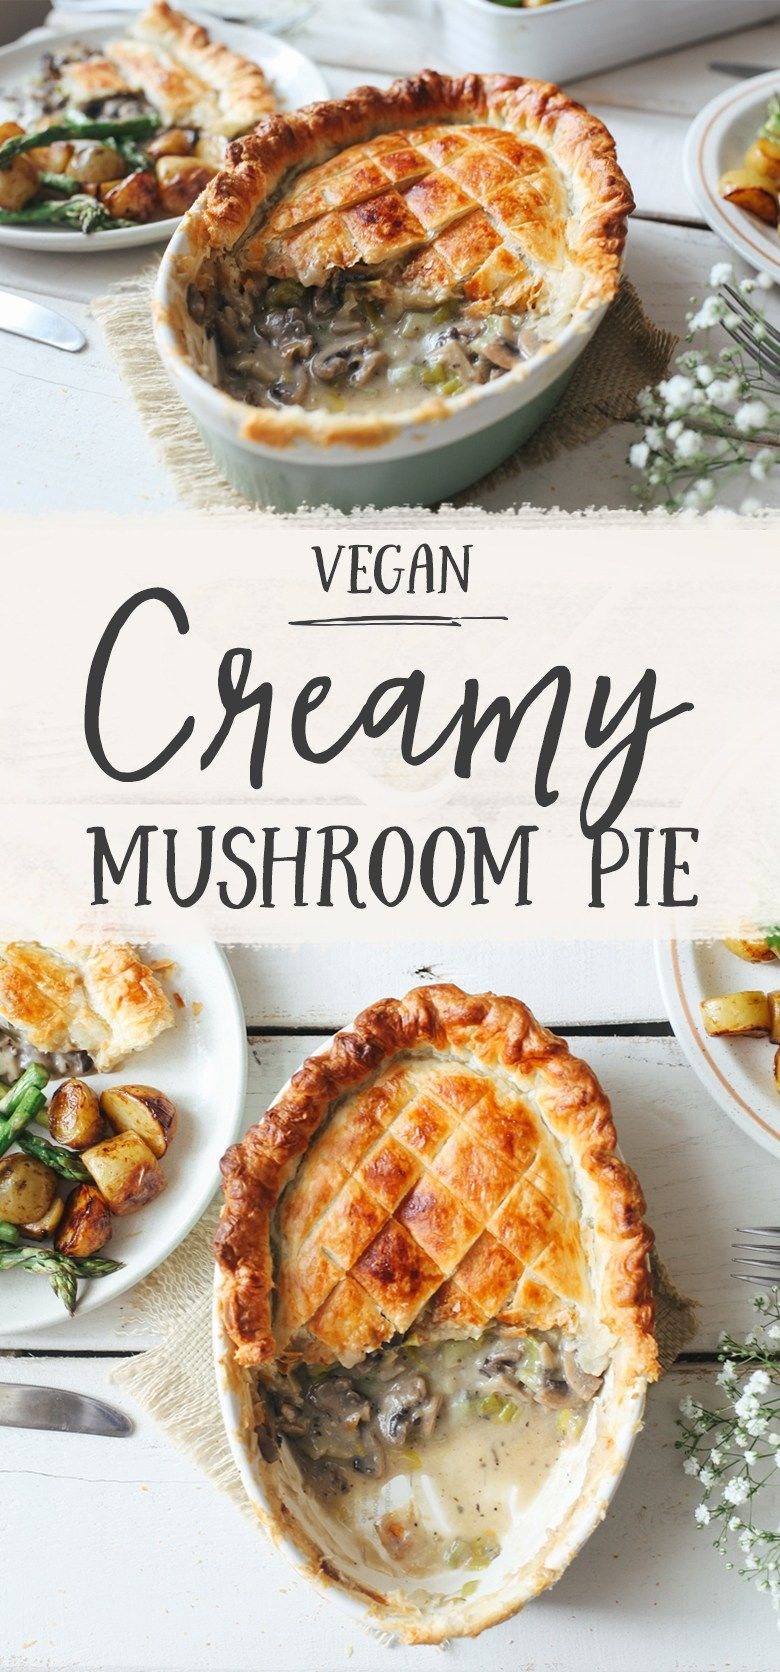 Vegan Recipes With Mushroom